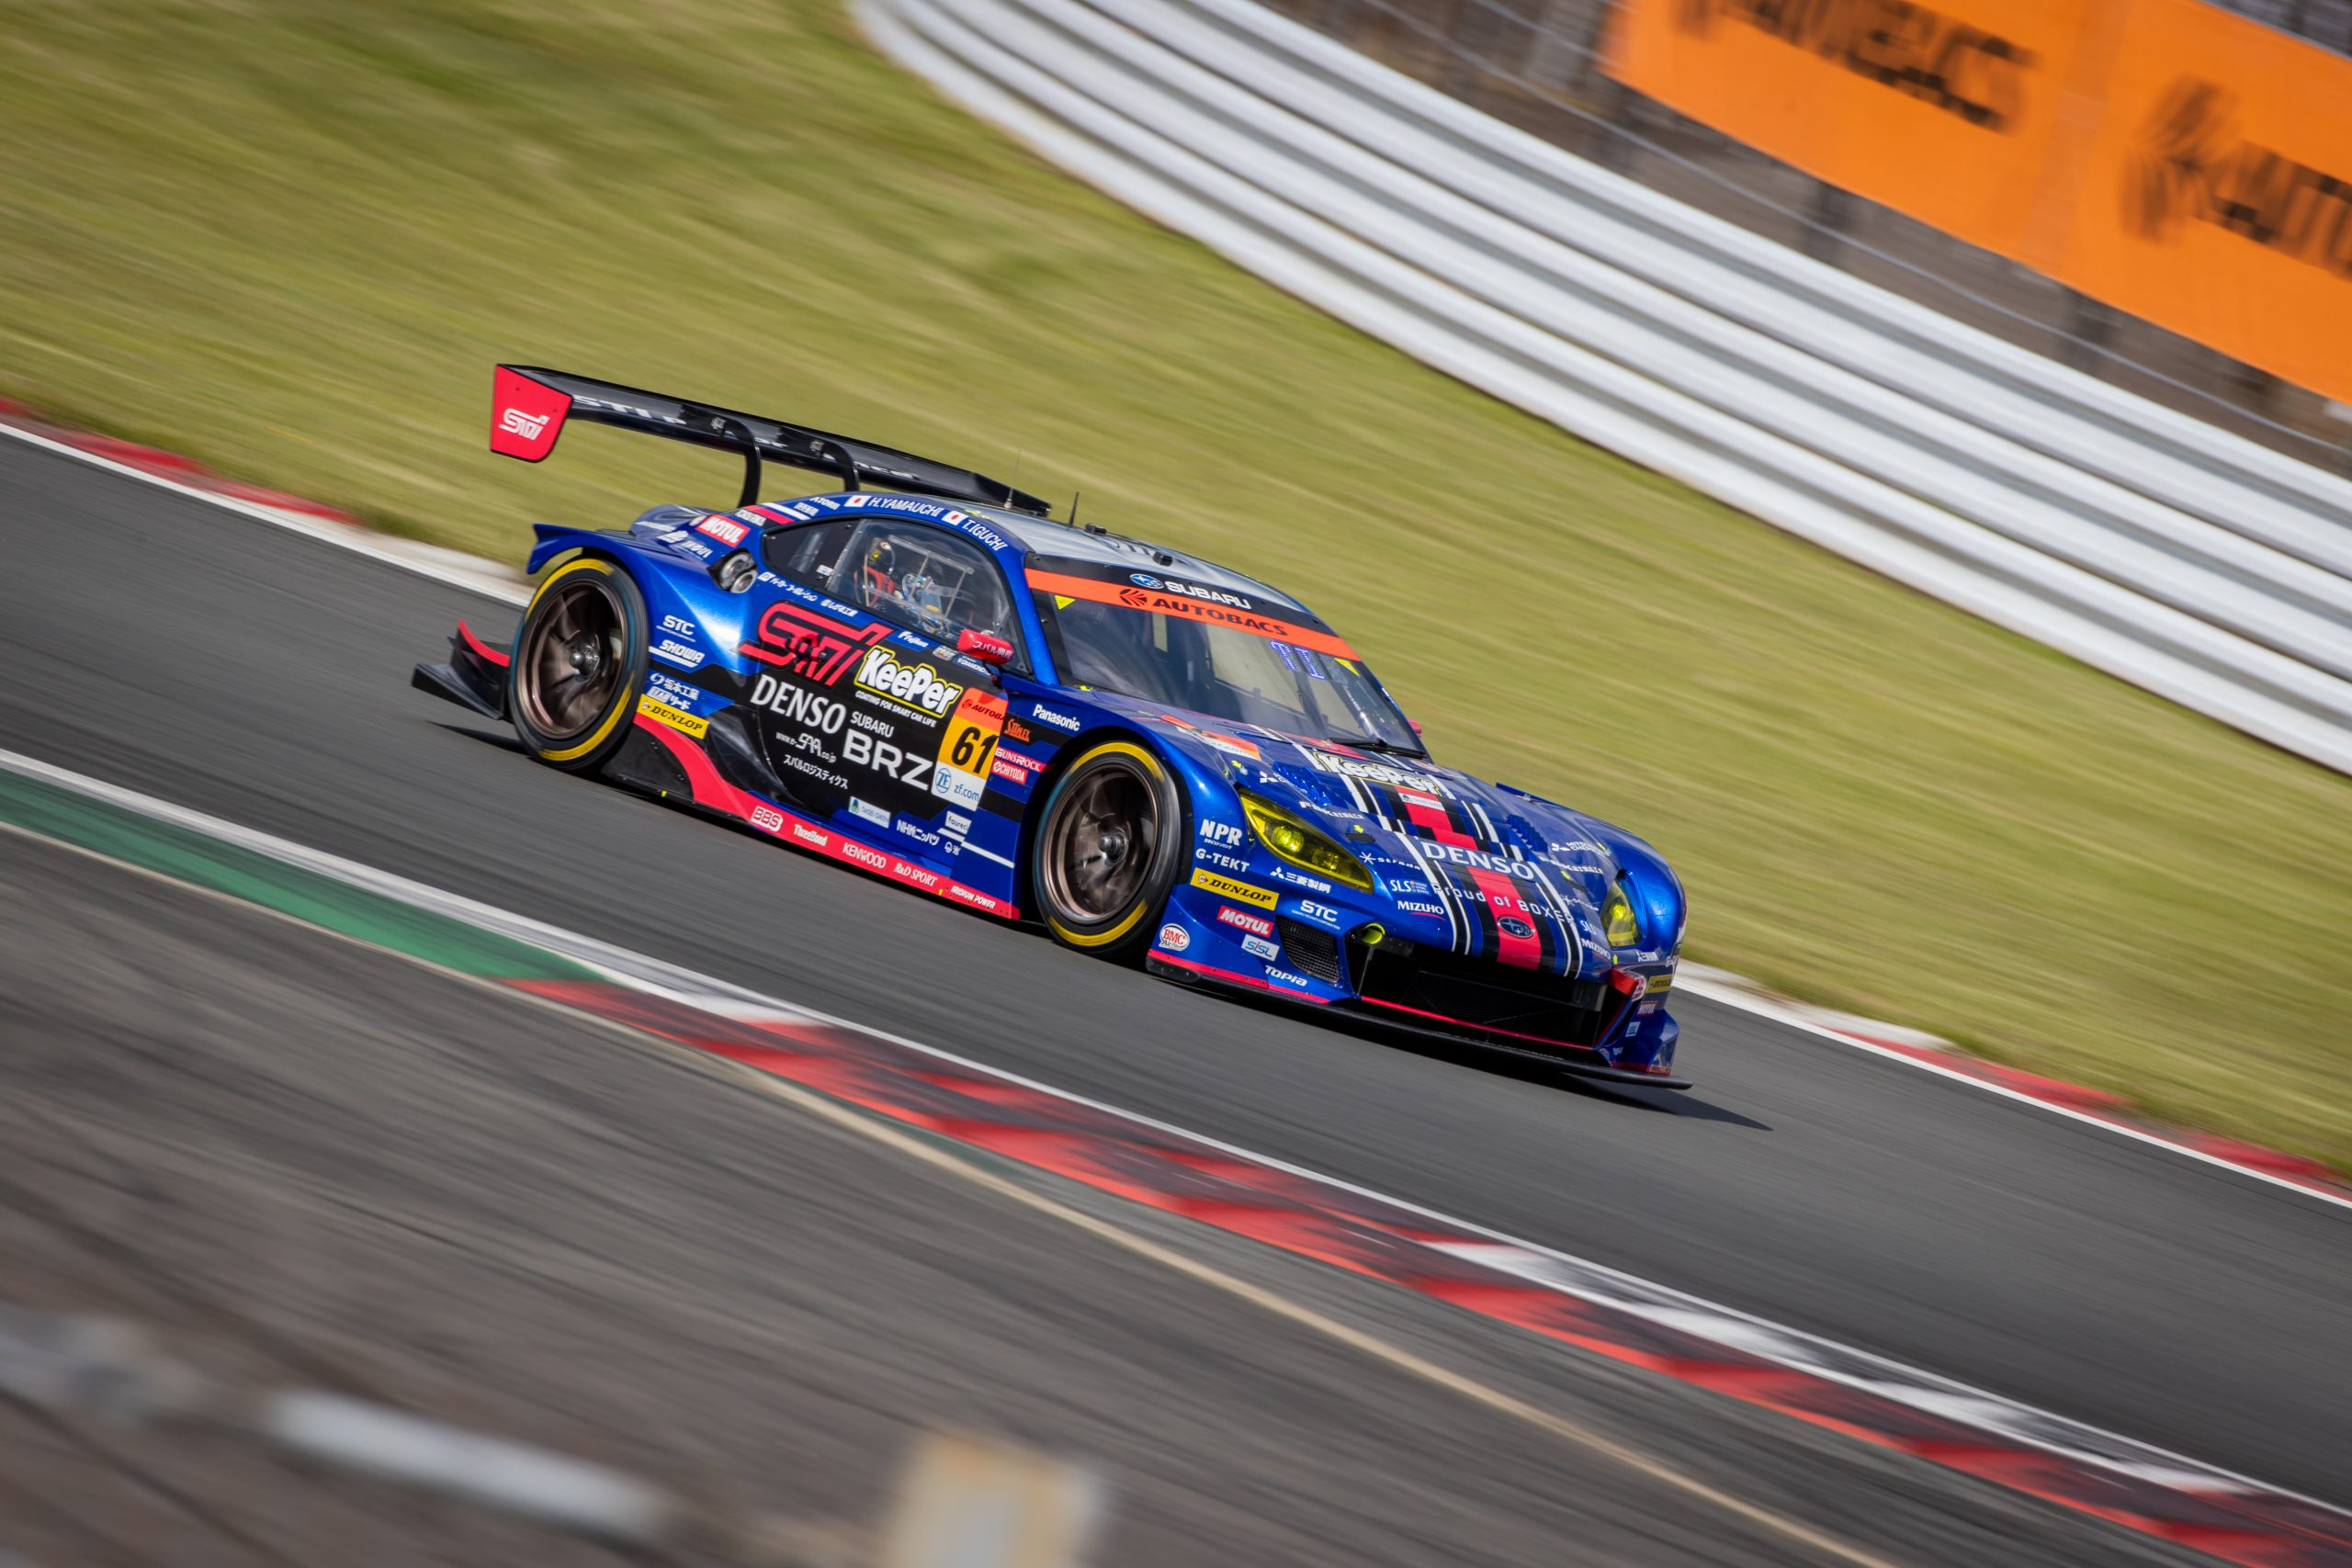 Motorsports photo #18【Canon EOS-1D X Mark III】